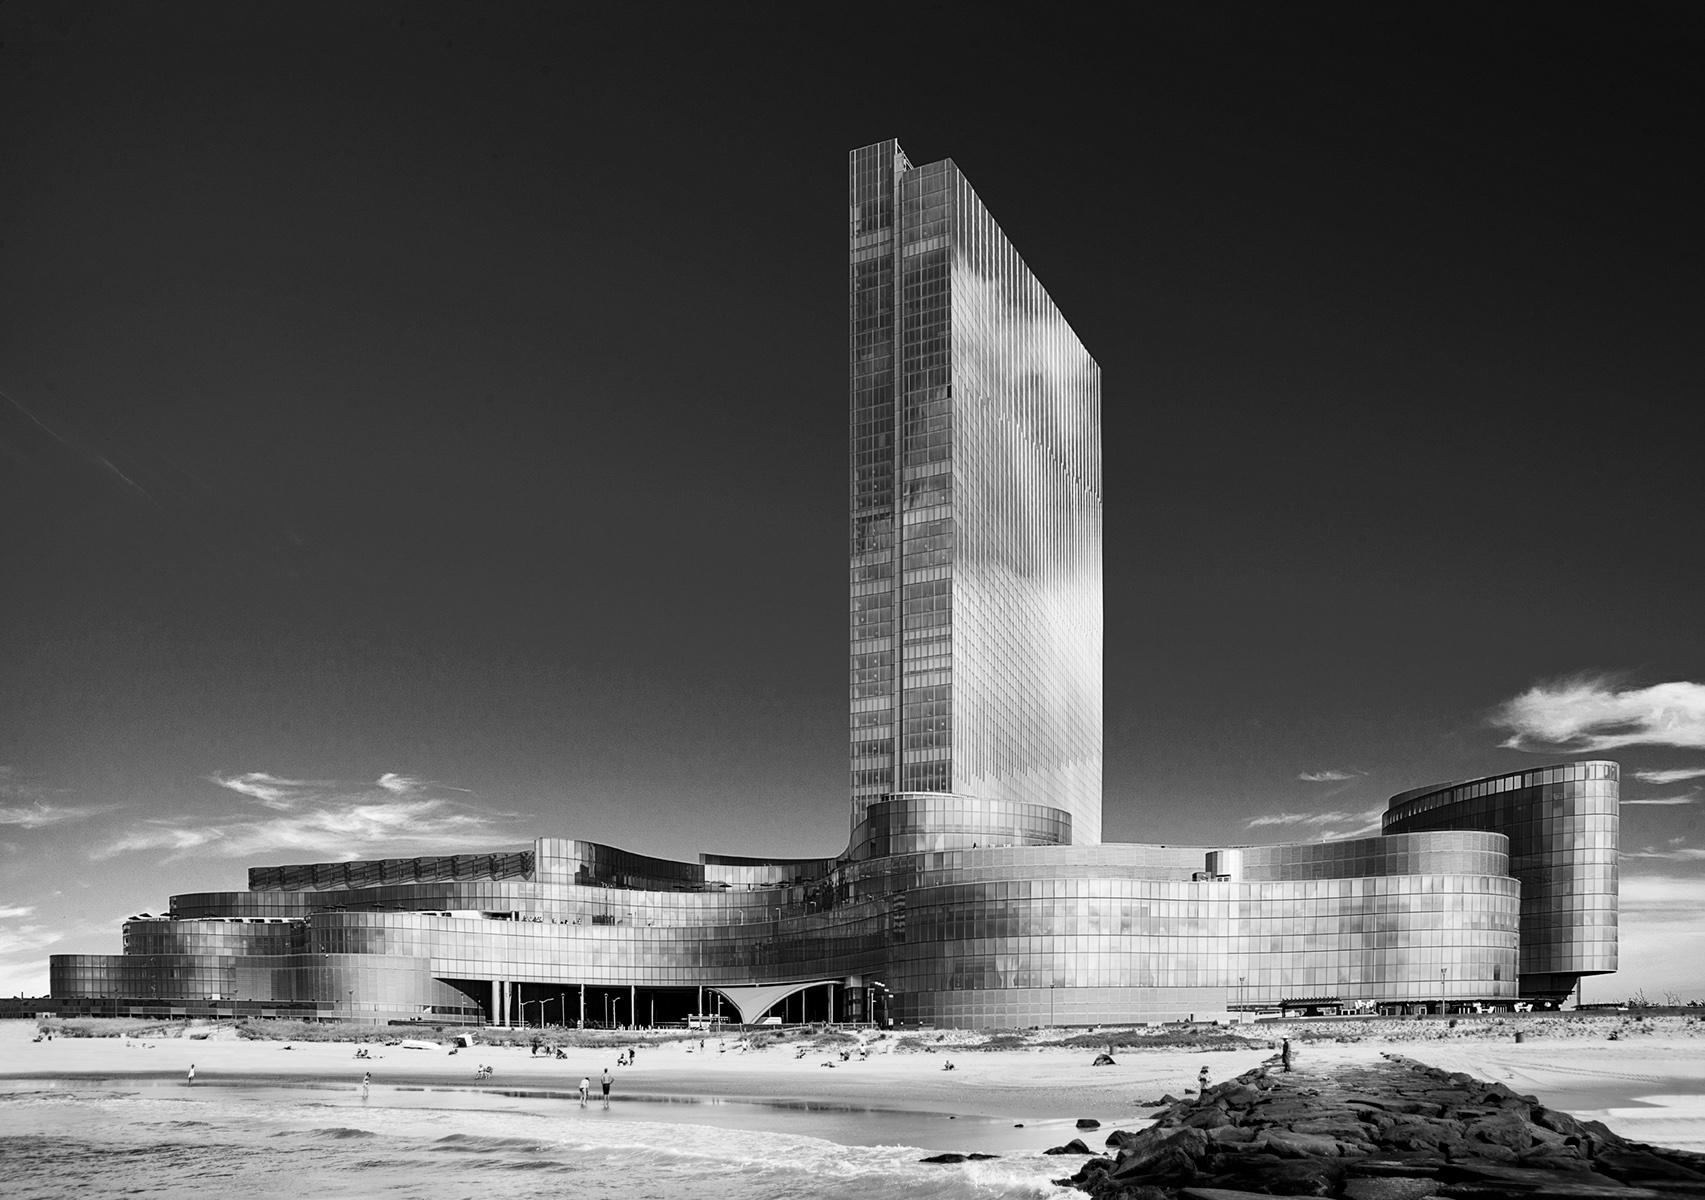 Ocean Casino Photographed by David Fonda